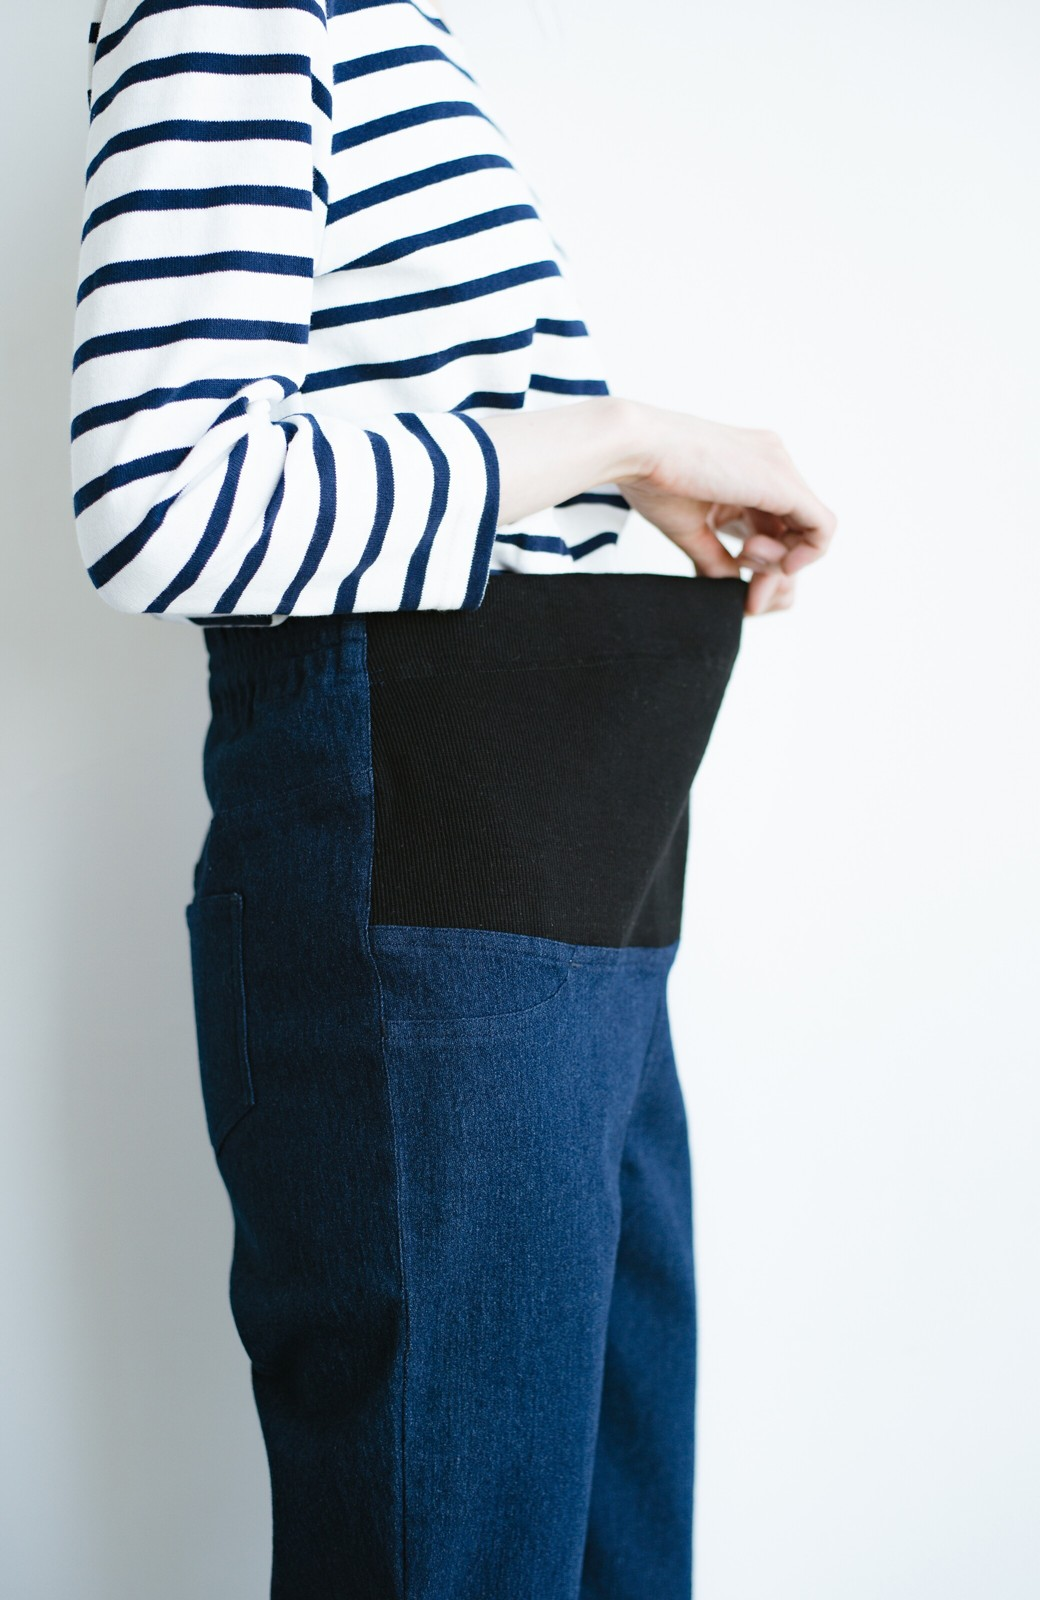 haco! おなかあったか安心感スキニーパンツ【ブルー期】女の子バンザイ!プロジェクト <ダークインディゴブルー>の商品写真4